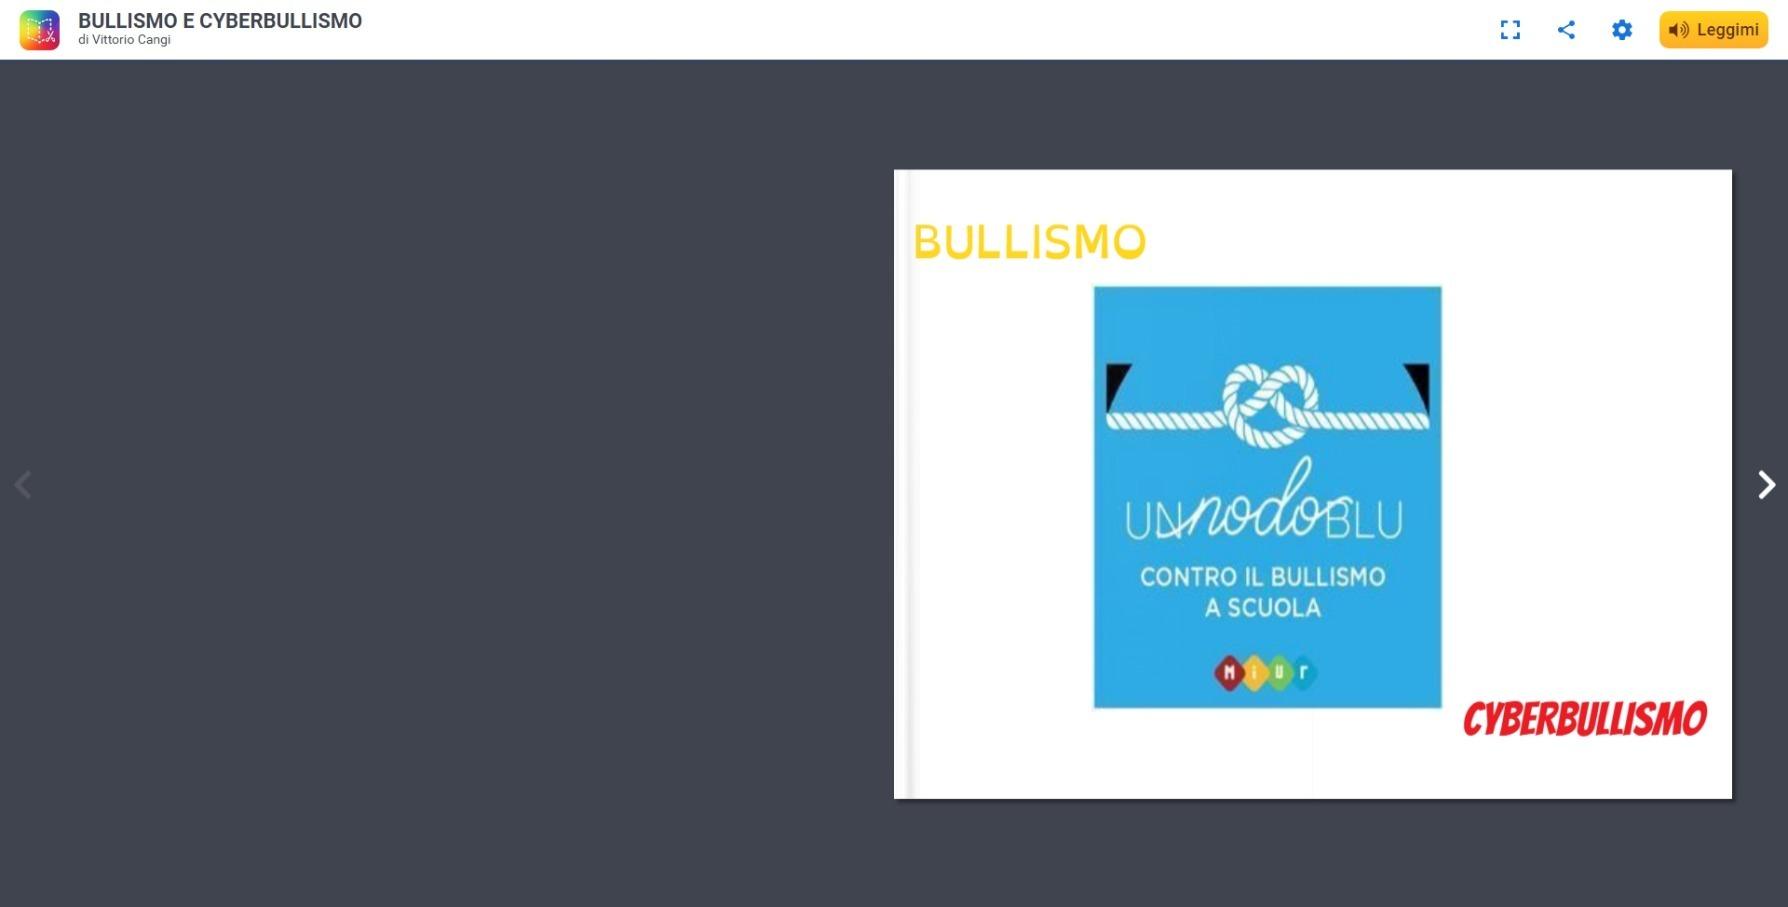 Bullismo--e-cyberbullismo_Cangi_Vittorio (1)